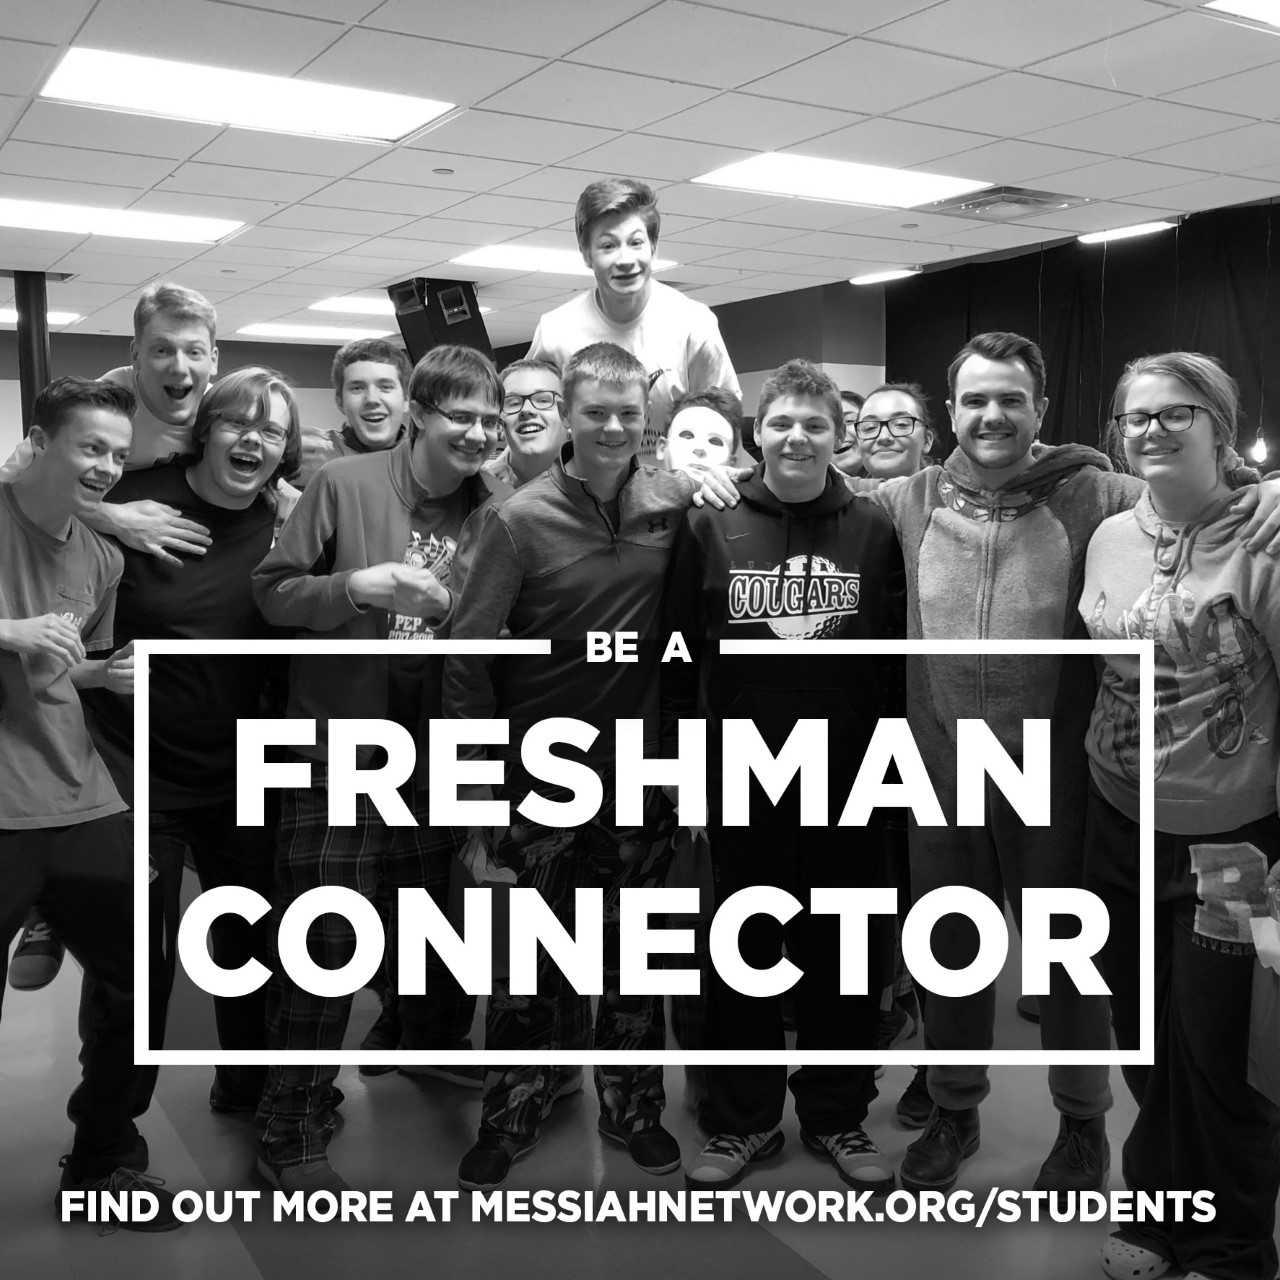 Freshman connector